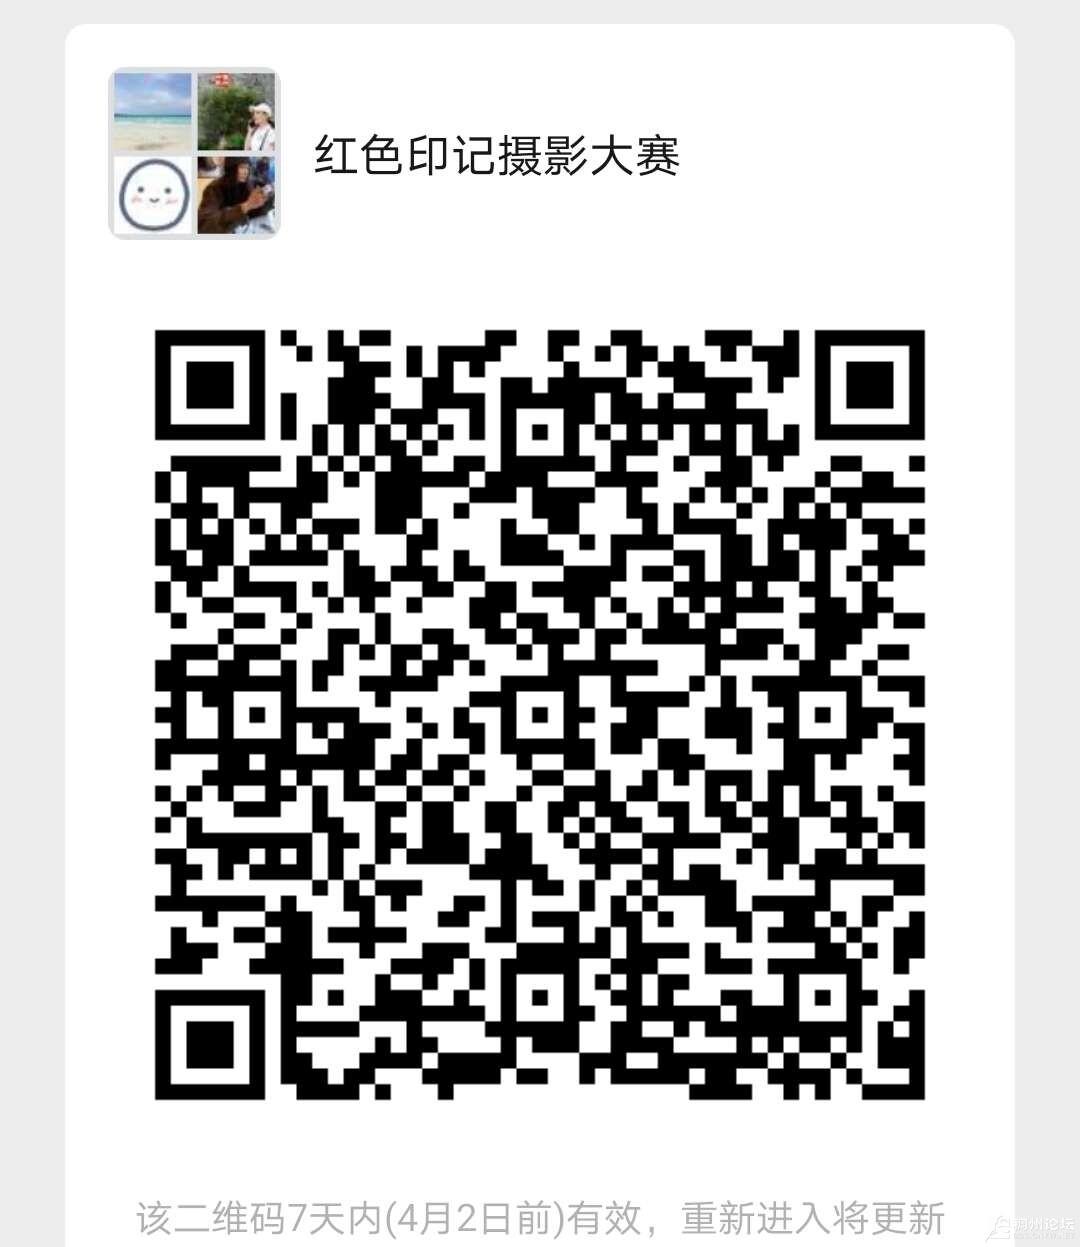 front2_0_FjmIg9M3UDRVWL3eKlIr0bnsNKUd.1616769866.jpg